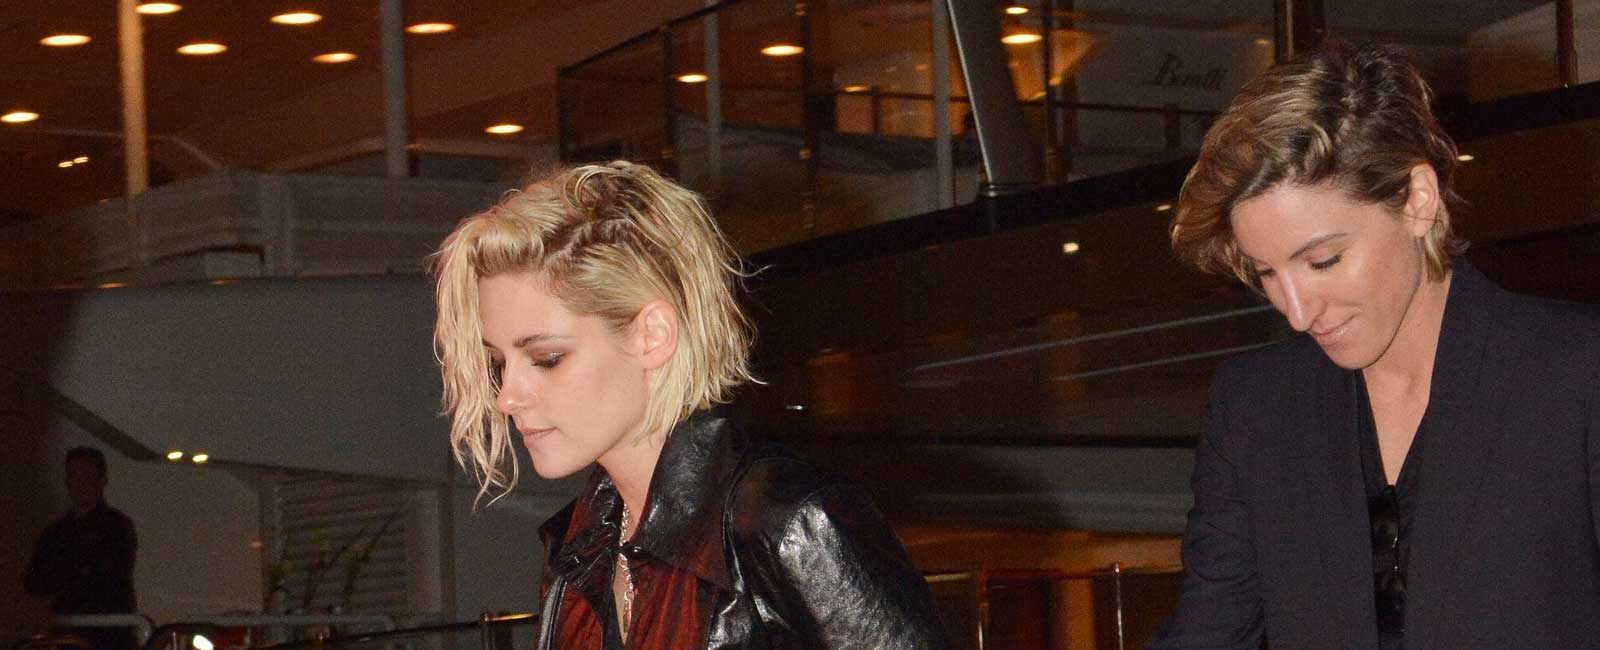 Kristen Stewart y Alicia Cargile ya no se ocultan